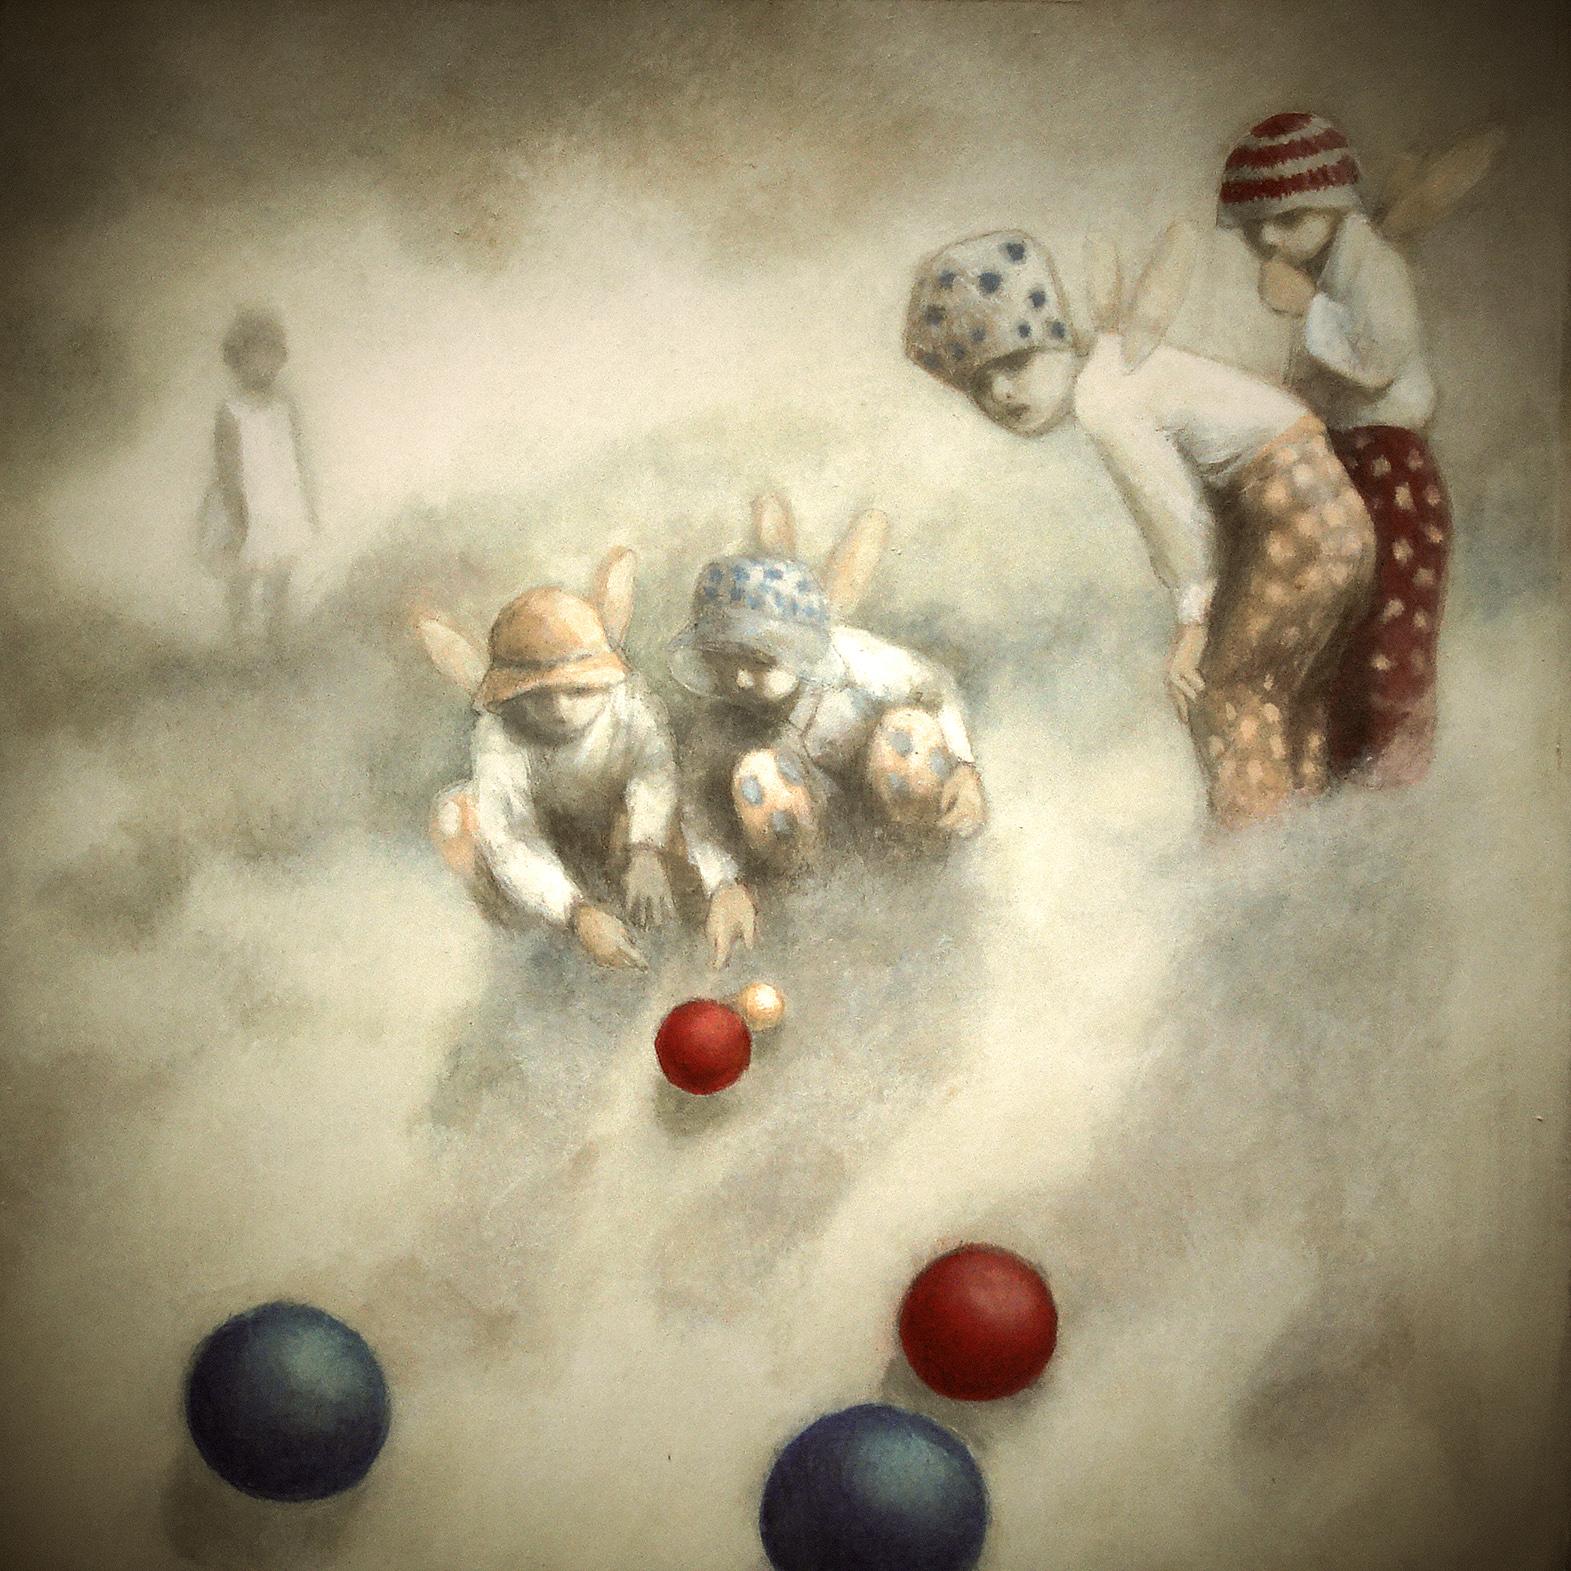 angels playing balls.jpg